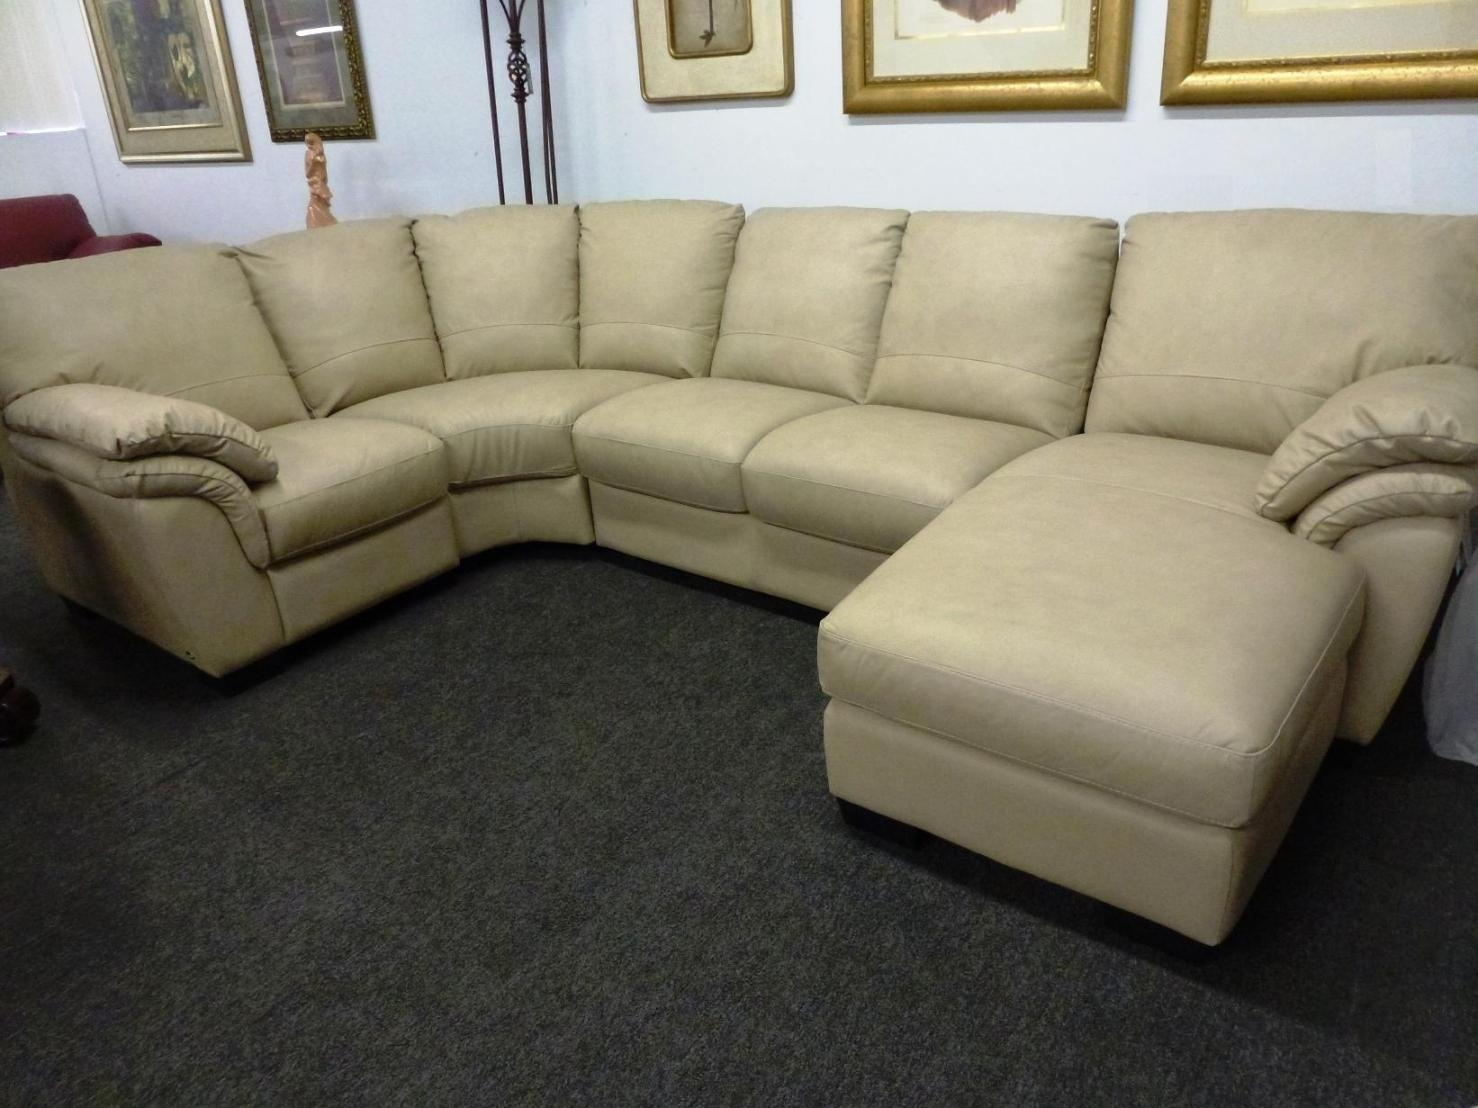 Natuzzi Leather Sofa For Sale | Tehranmix Decoration Regarding Natuzzi Microfiber Sectional Sofas (Image 10 of 20)